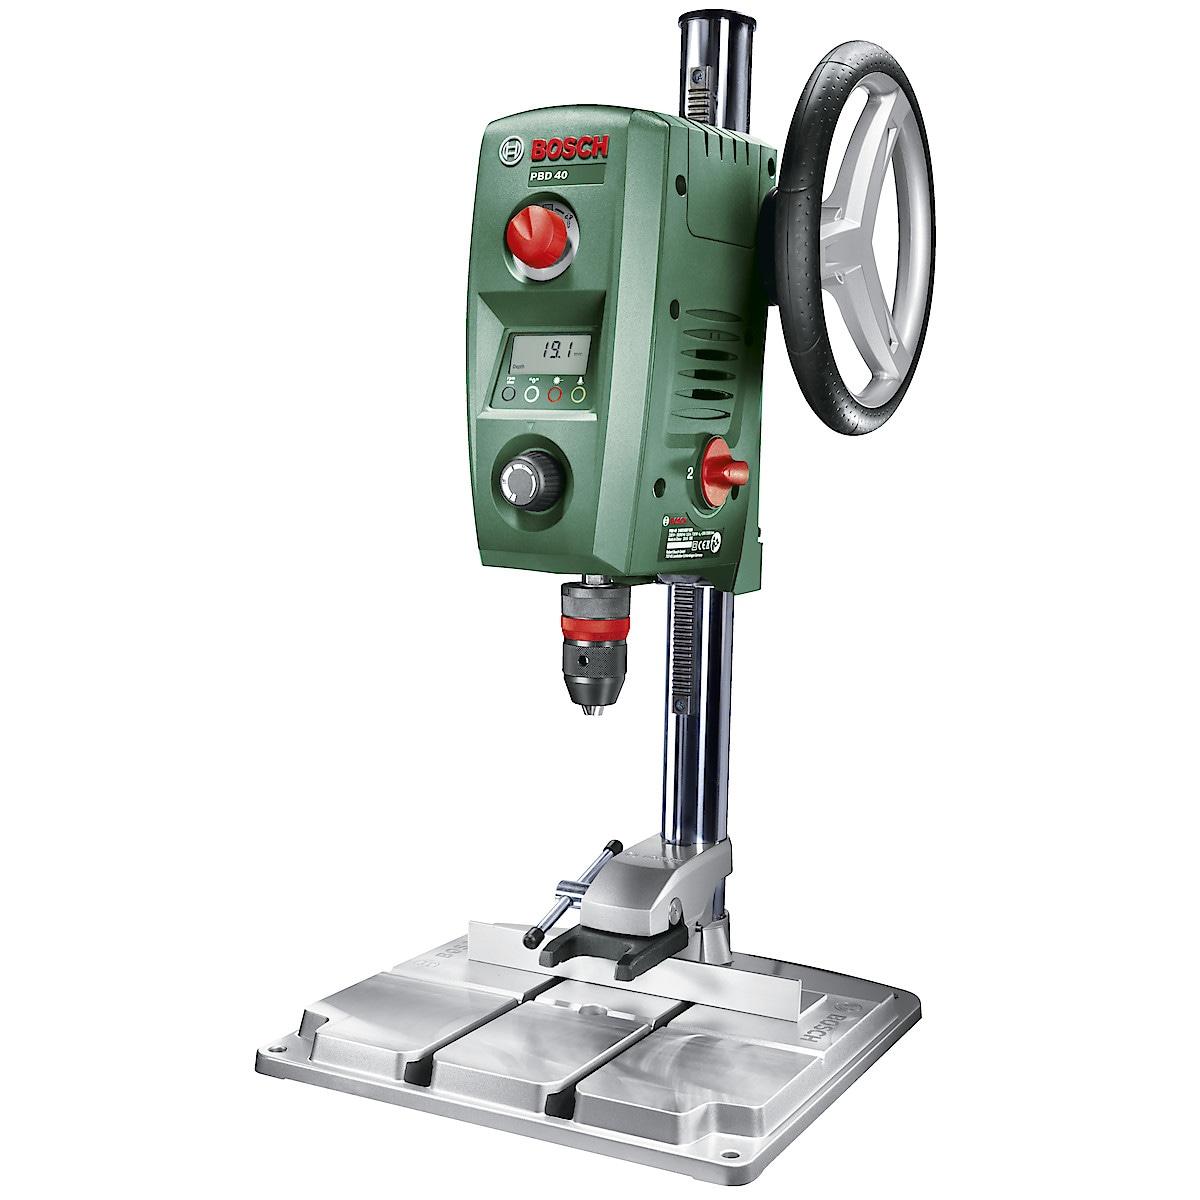 Bänkborrmaskin Bosch PBD 40